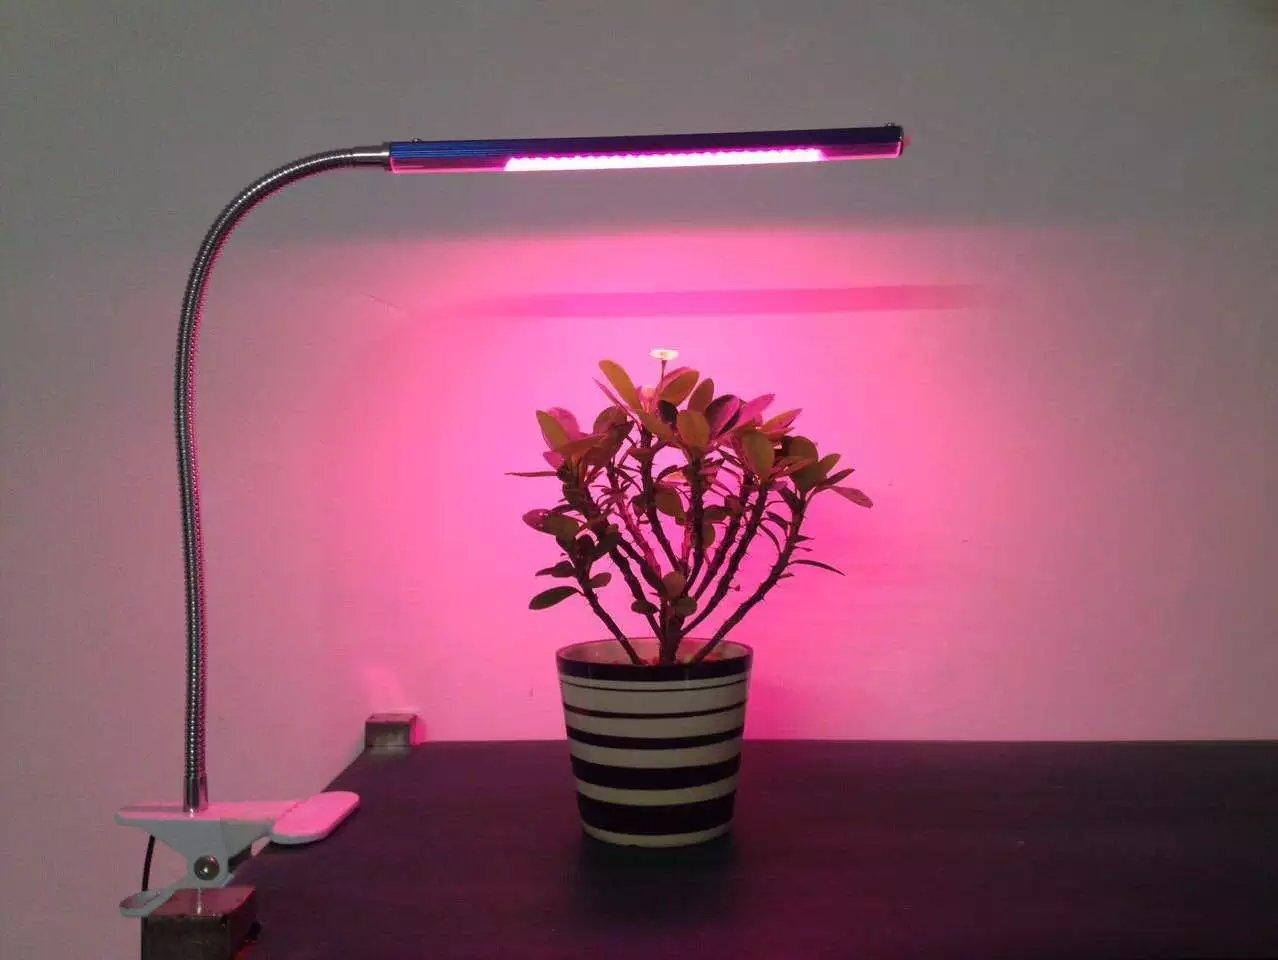 5WLED植物补光夹子灯 LED园艺植物补光夹子灯